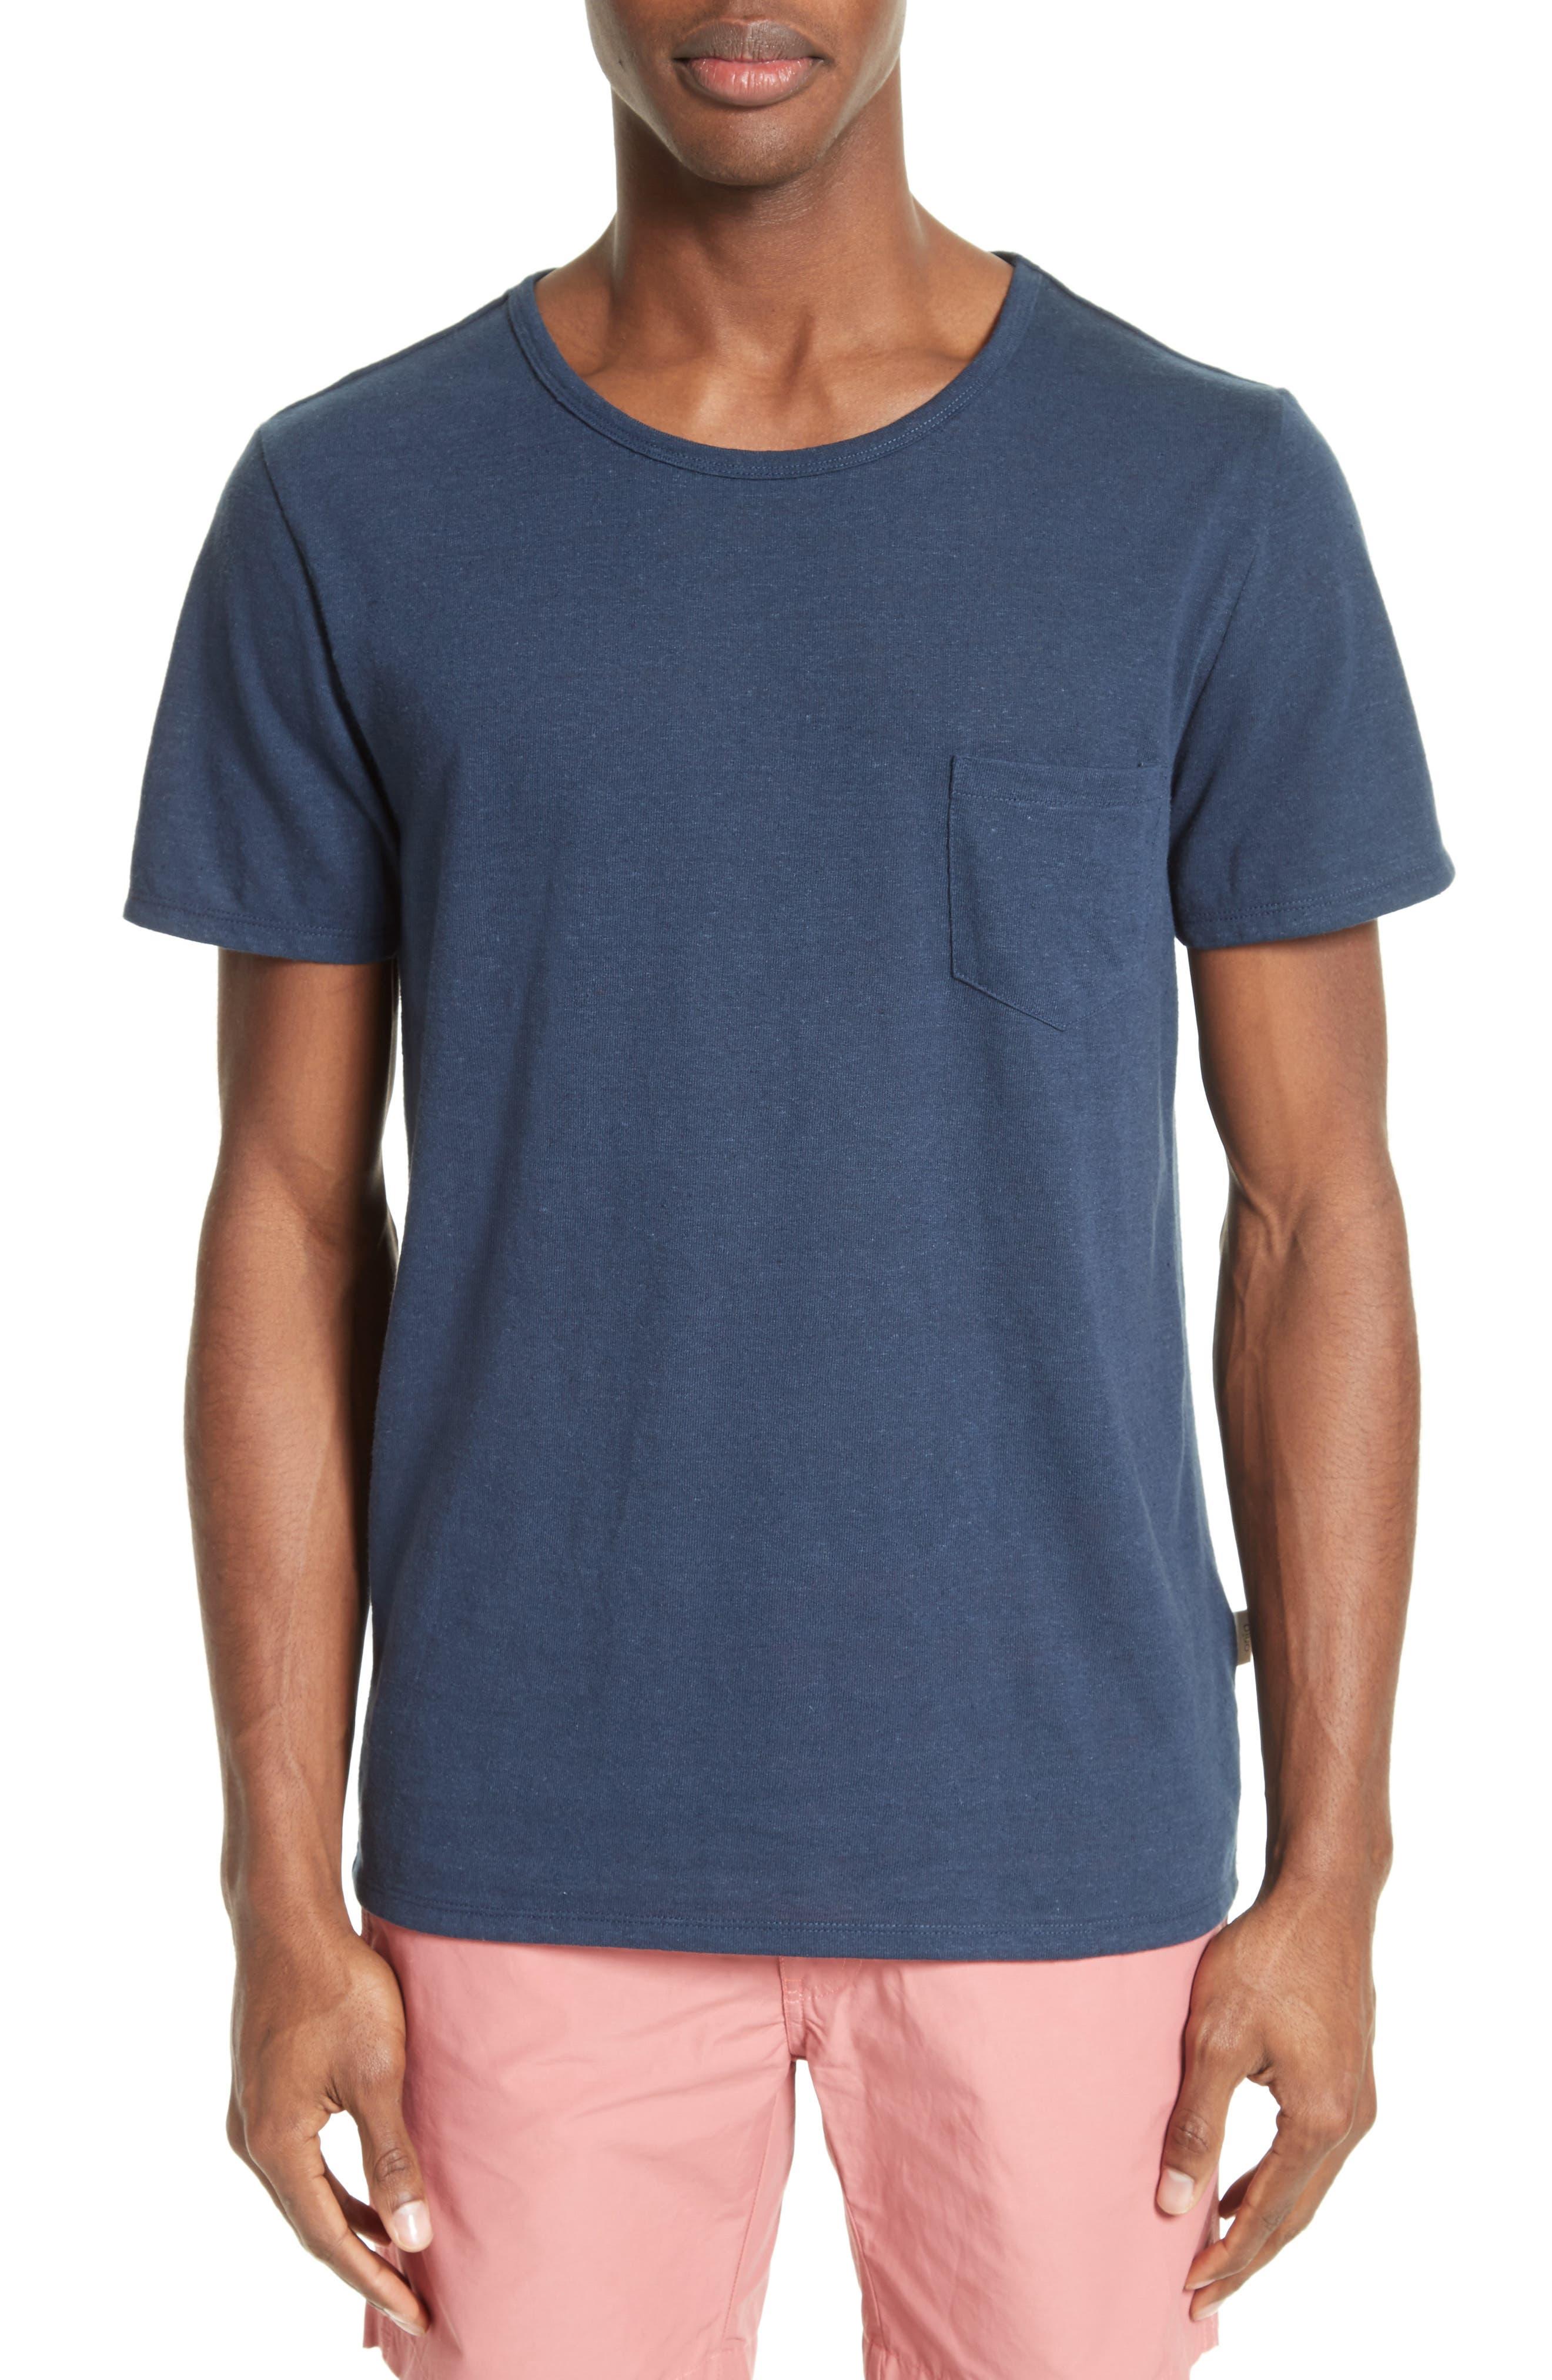 Main Image - ONIA Chad Linen Blend Pocket T-Shirt